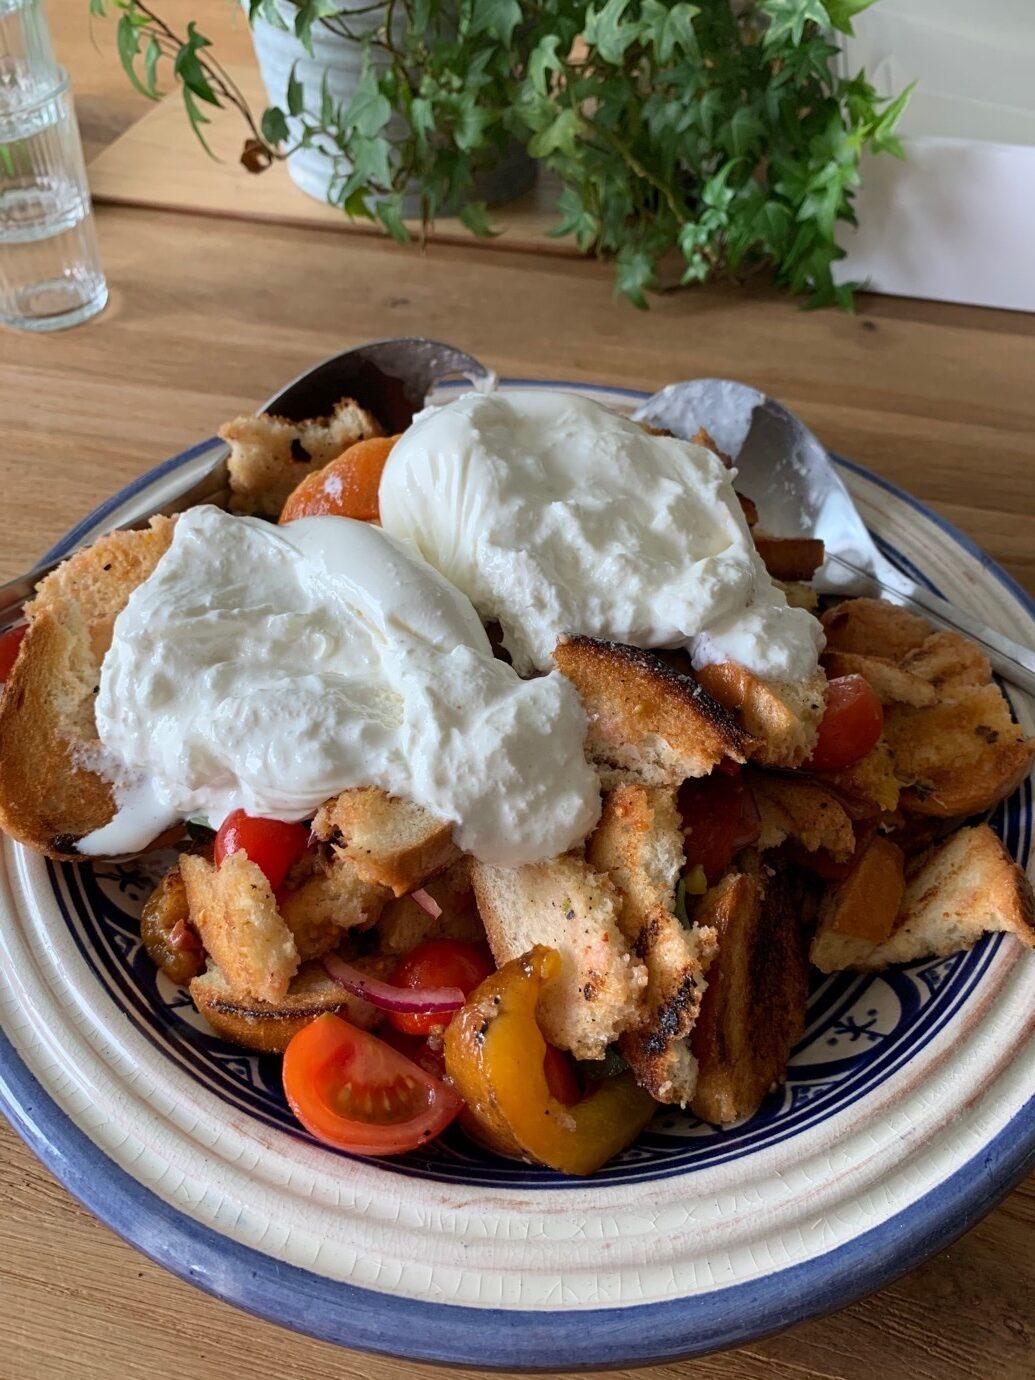 Grilled Nectarine and Burrata Panzanella Salad